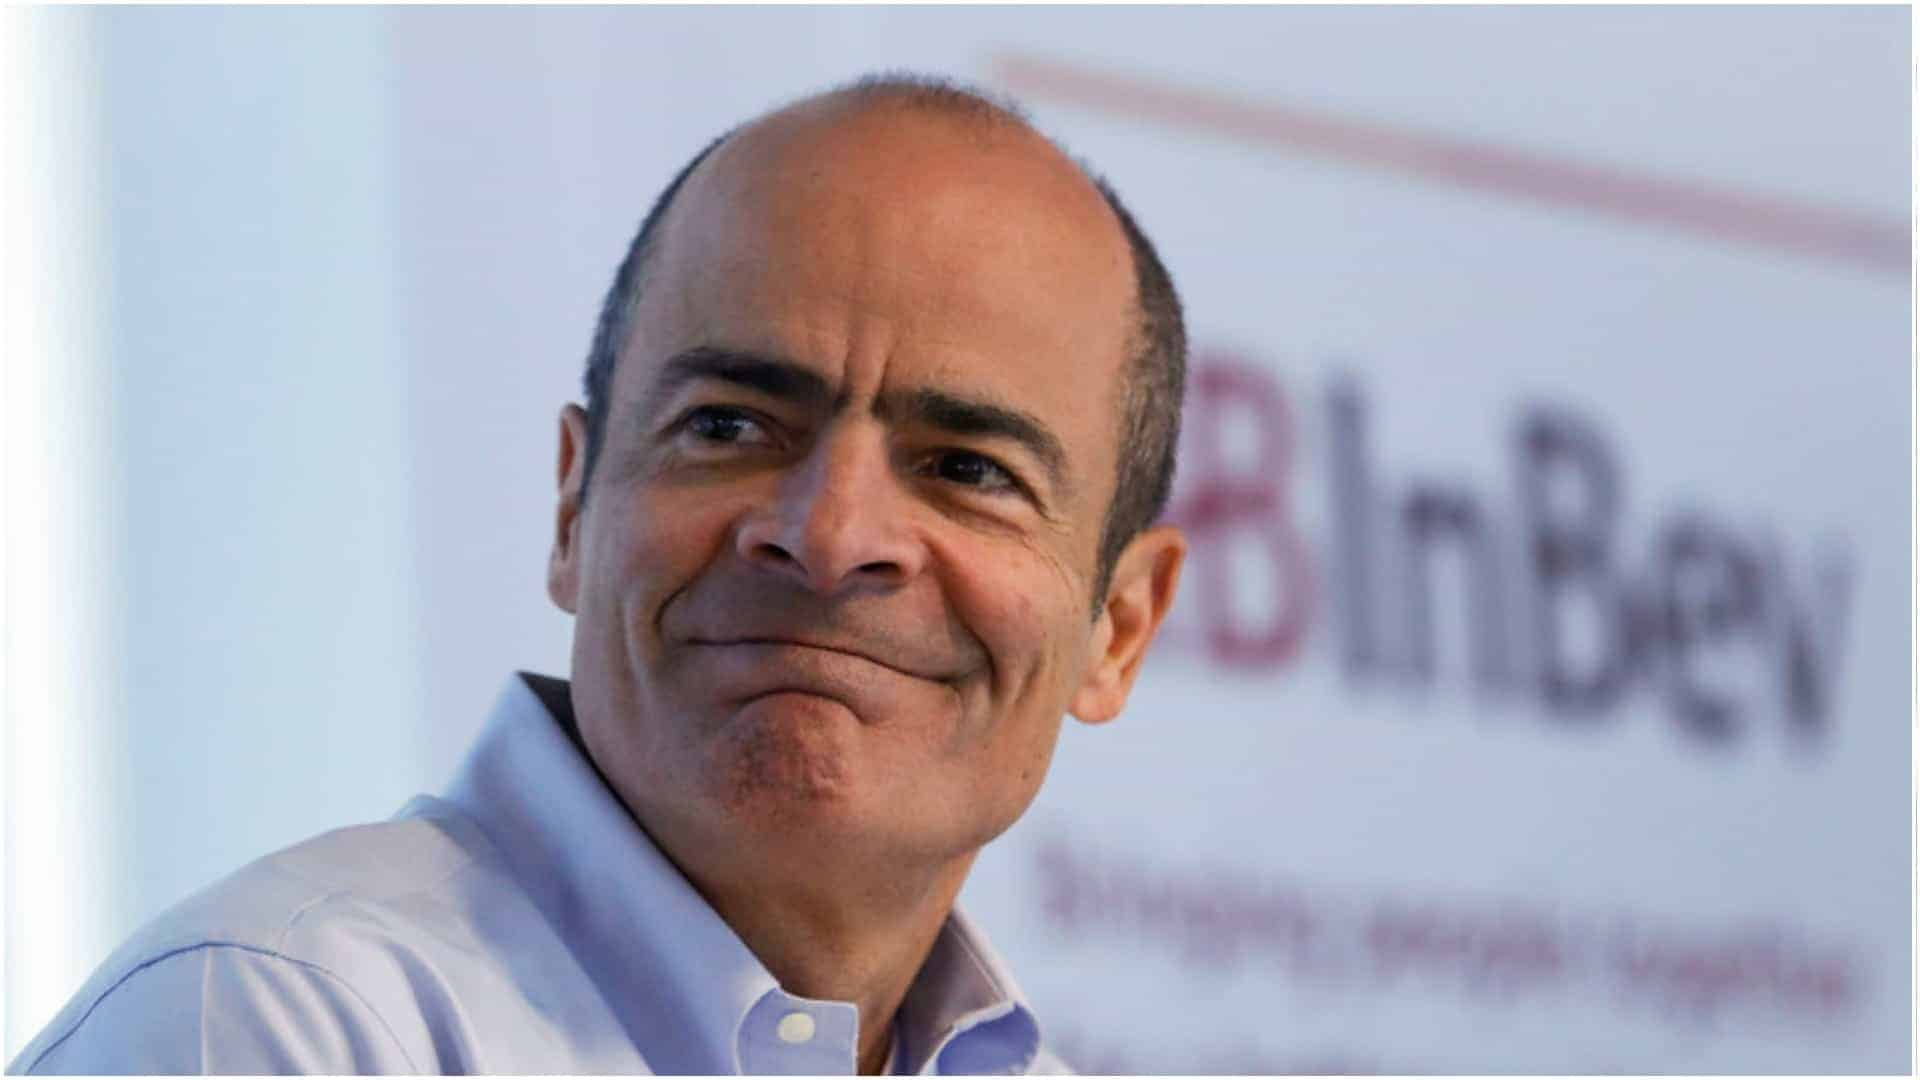 AB InBev-topman Carlos Brito: 'Je bent nog niet van mij af'